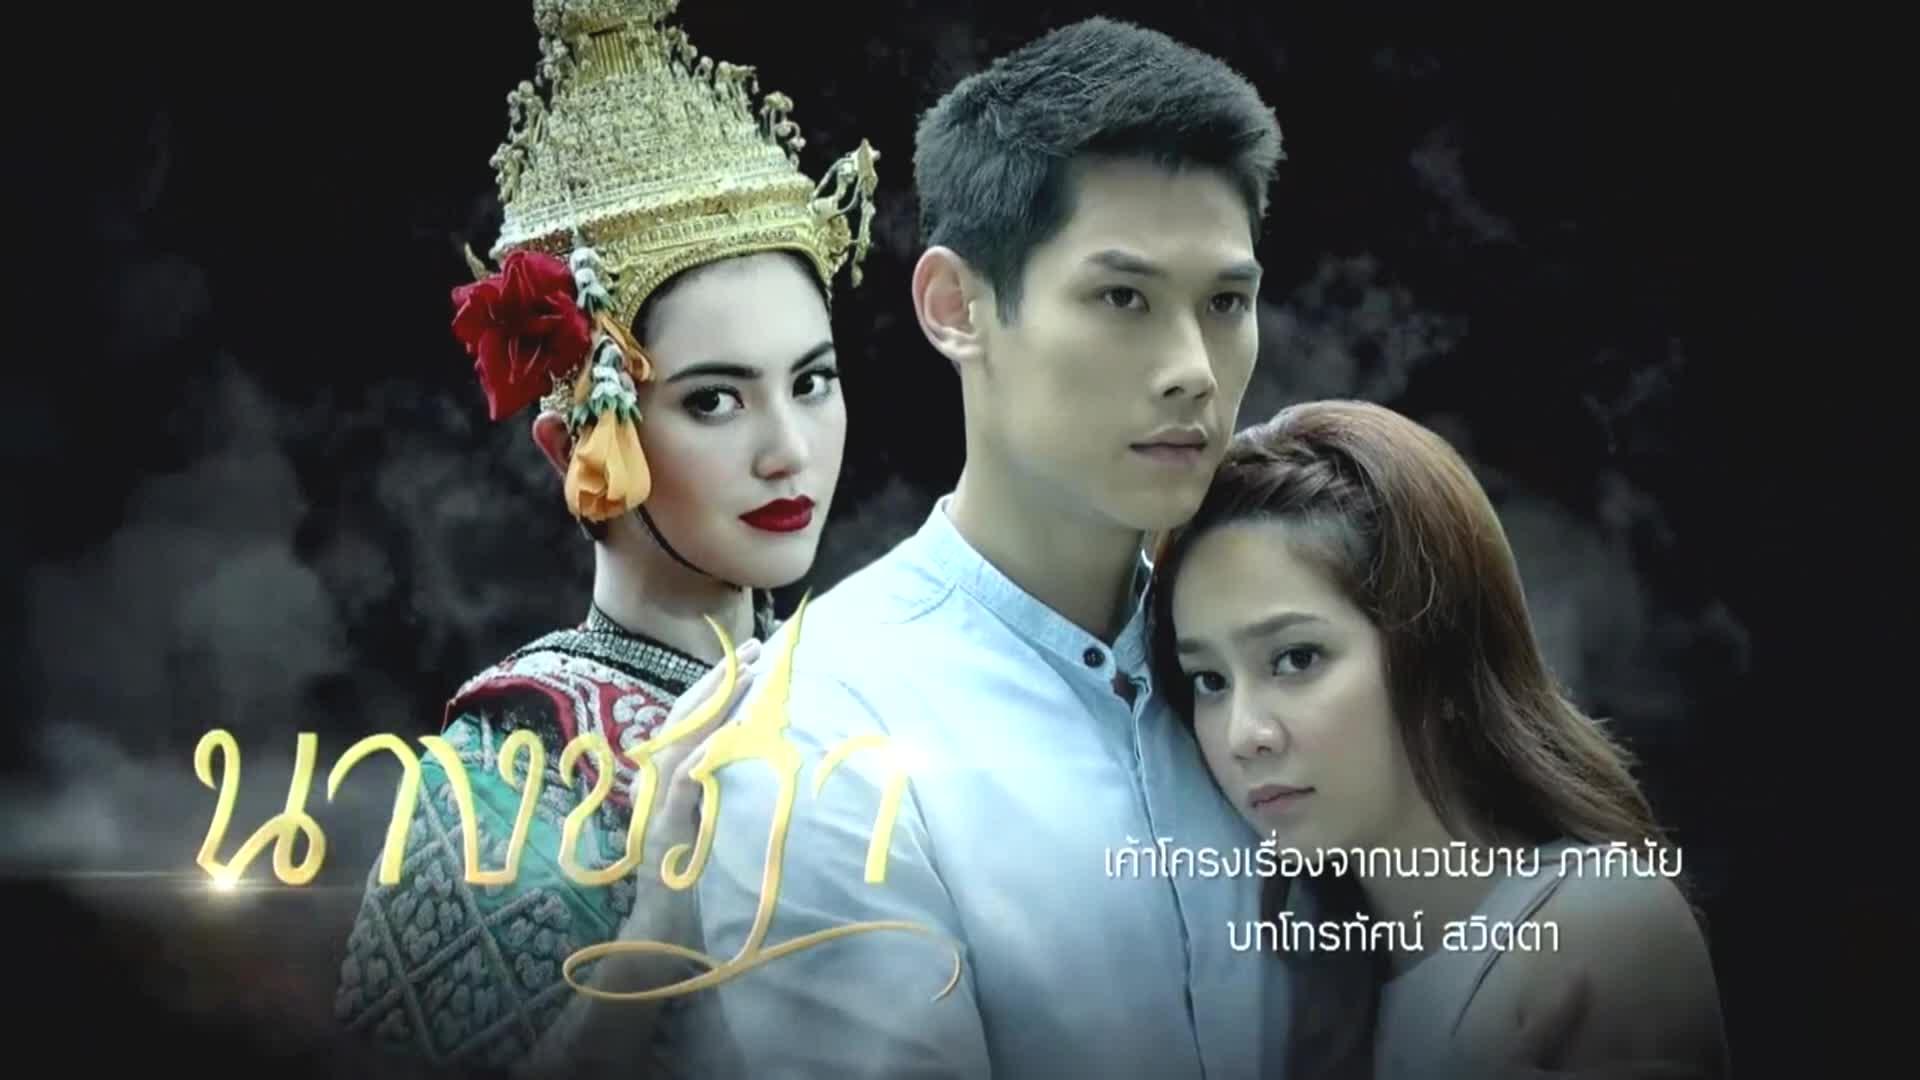 Thai sex movies online in Perth